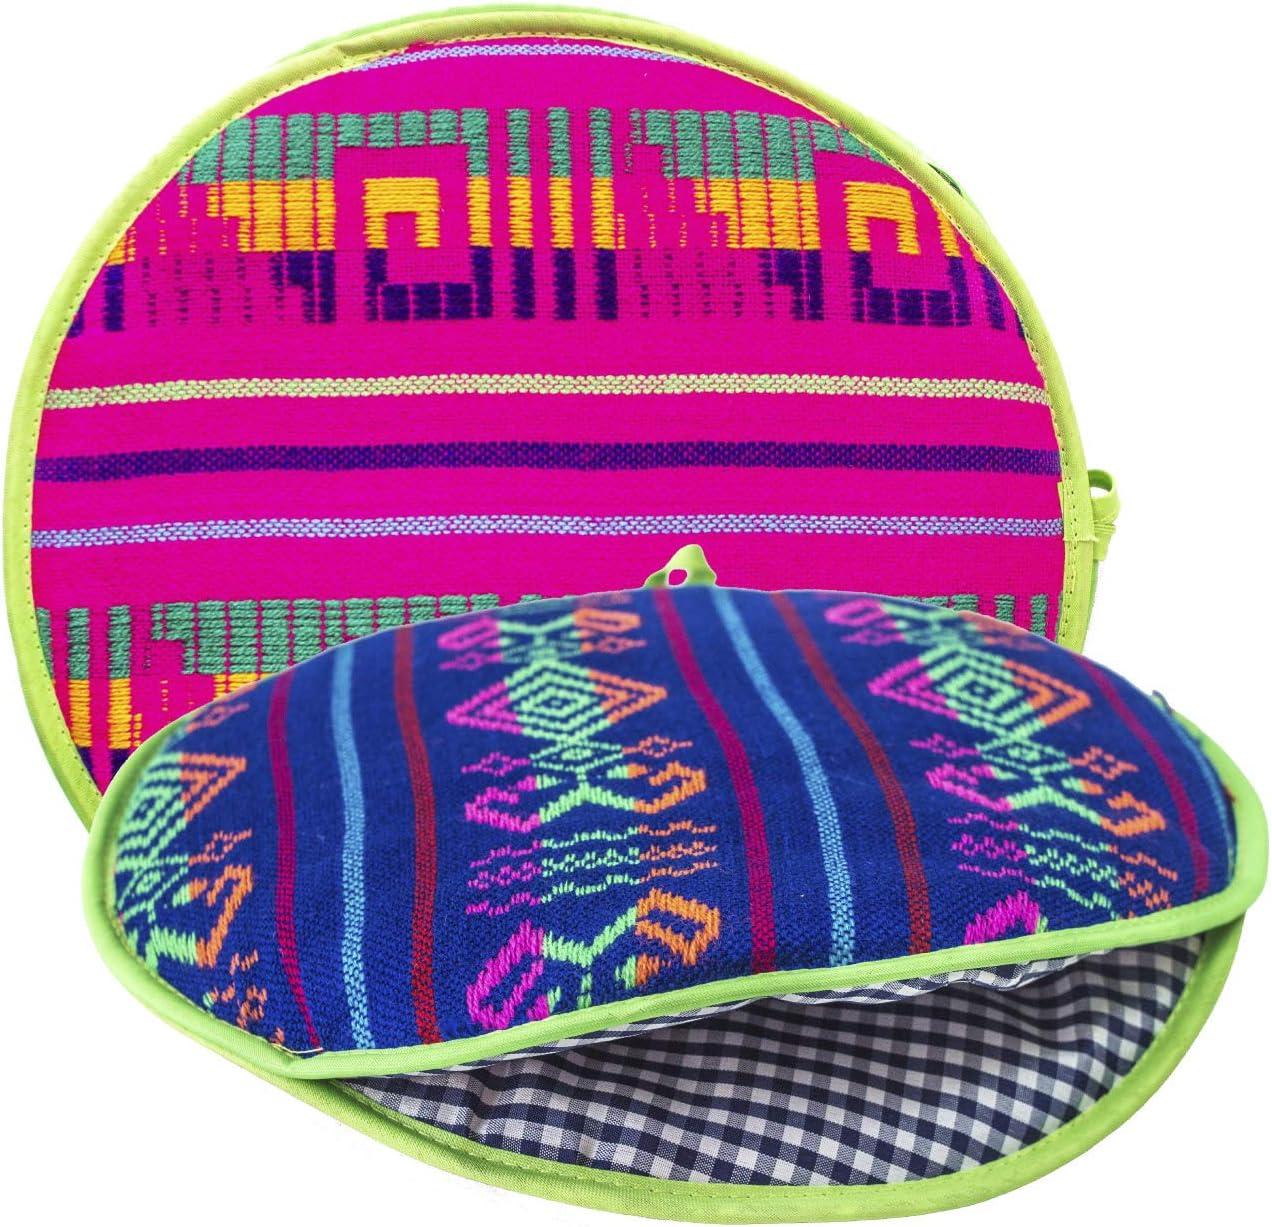 Authentic Mexican Cloth Tortilla Holder Warmer Pouch. Insulated Tortillera Mexicana Microwave Oven Safe for Corn, Flour Taco, Burrito, Quesadilla,Bread, Roti. Tortillero Termico de Tela Fucsia